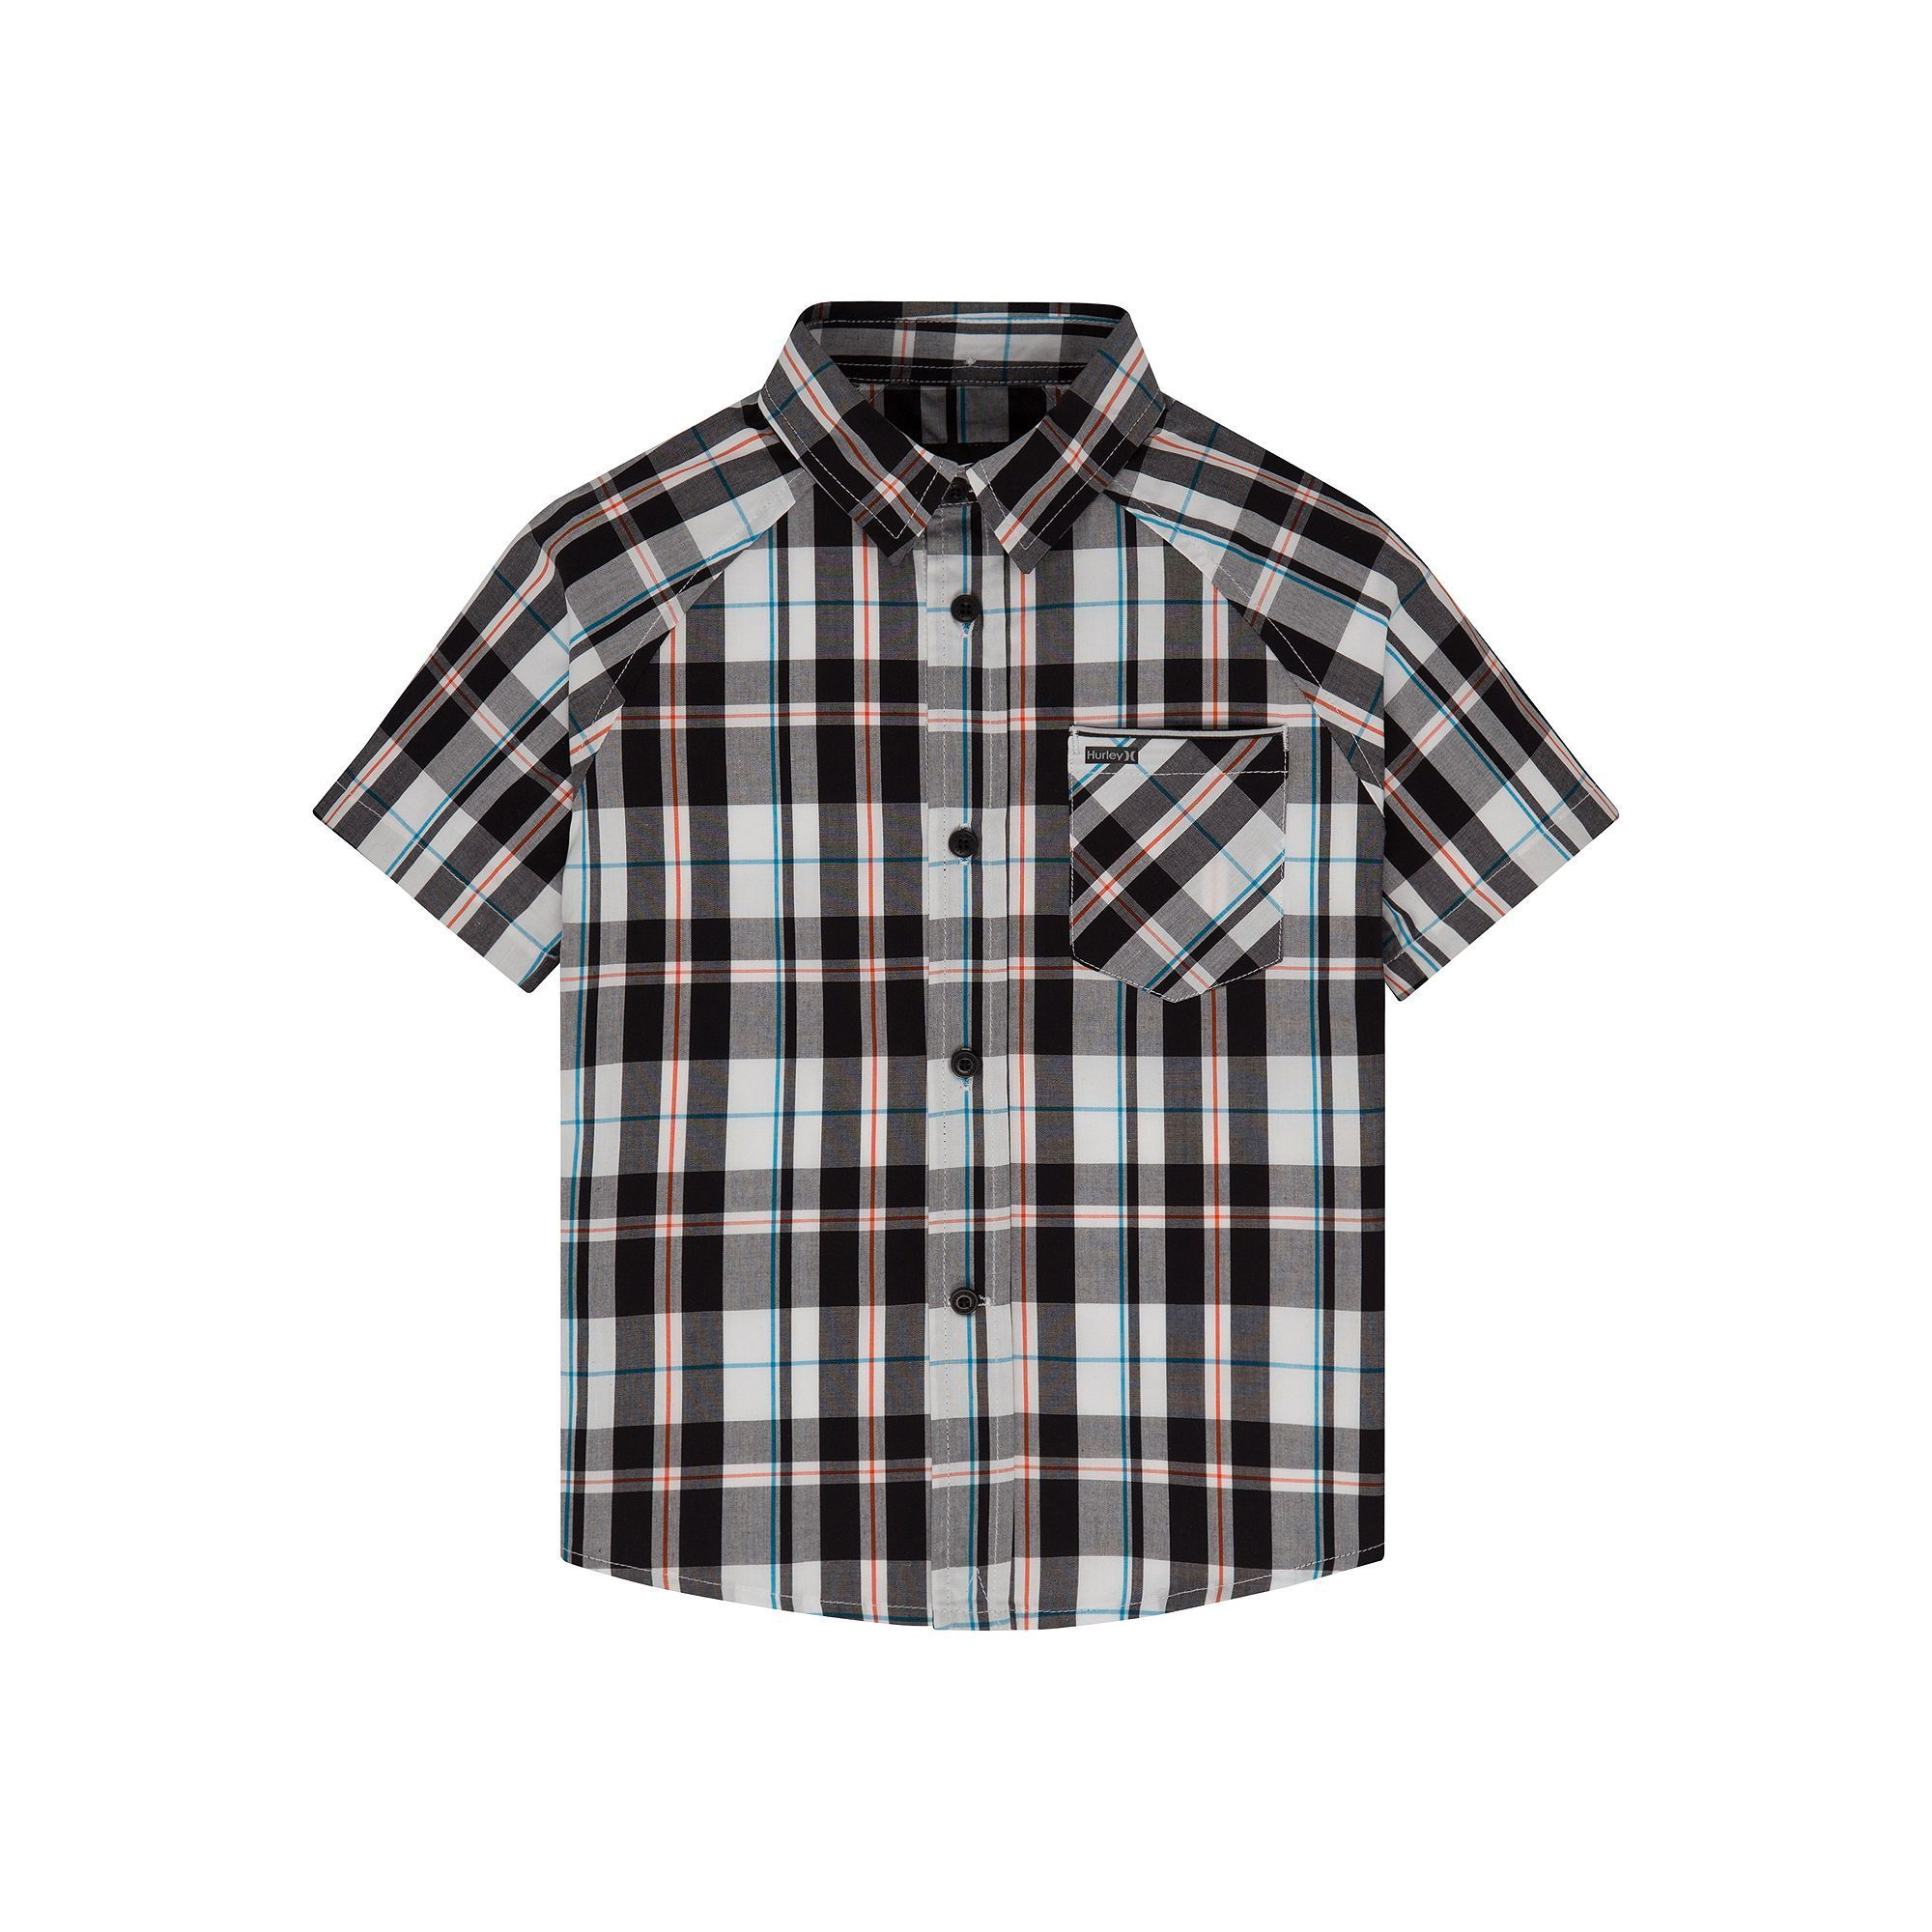 19e9417e8 Toddler Boy Hurley Raglan Woven Plaid Button-Down Shirt, Size: 3T, Grey  (Charcoal)